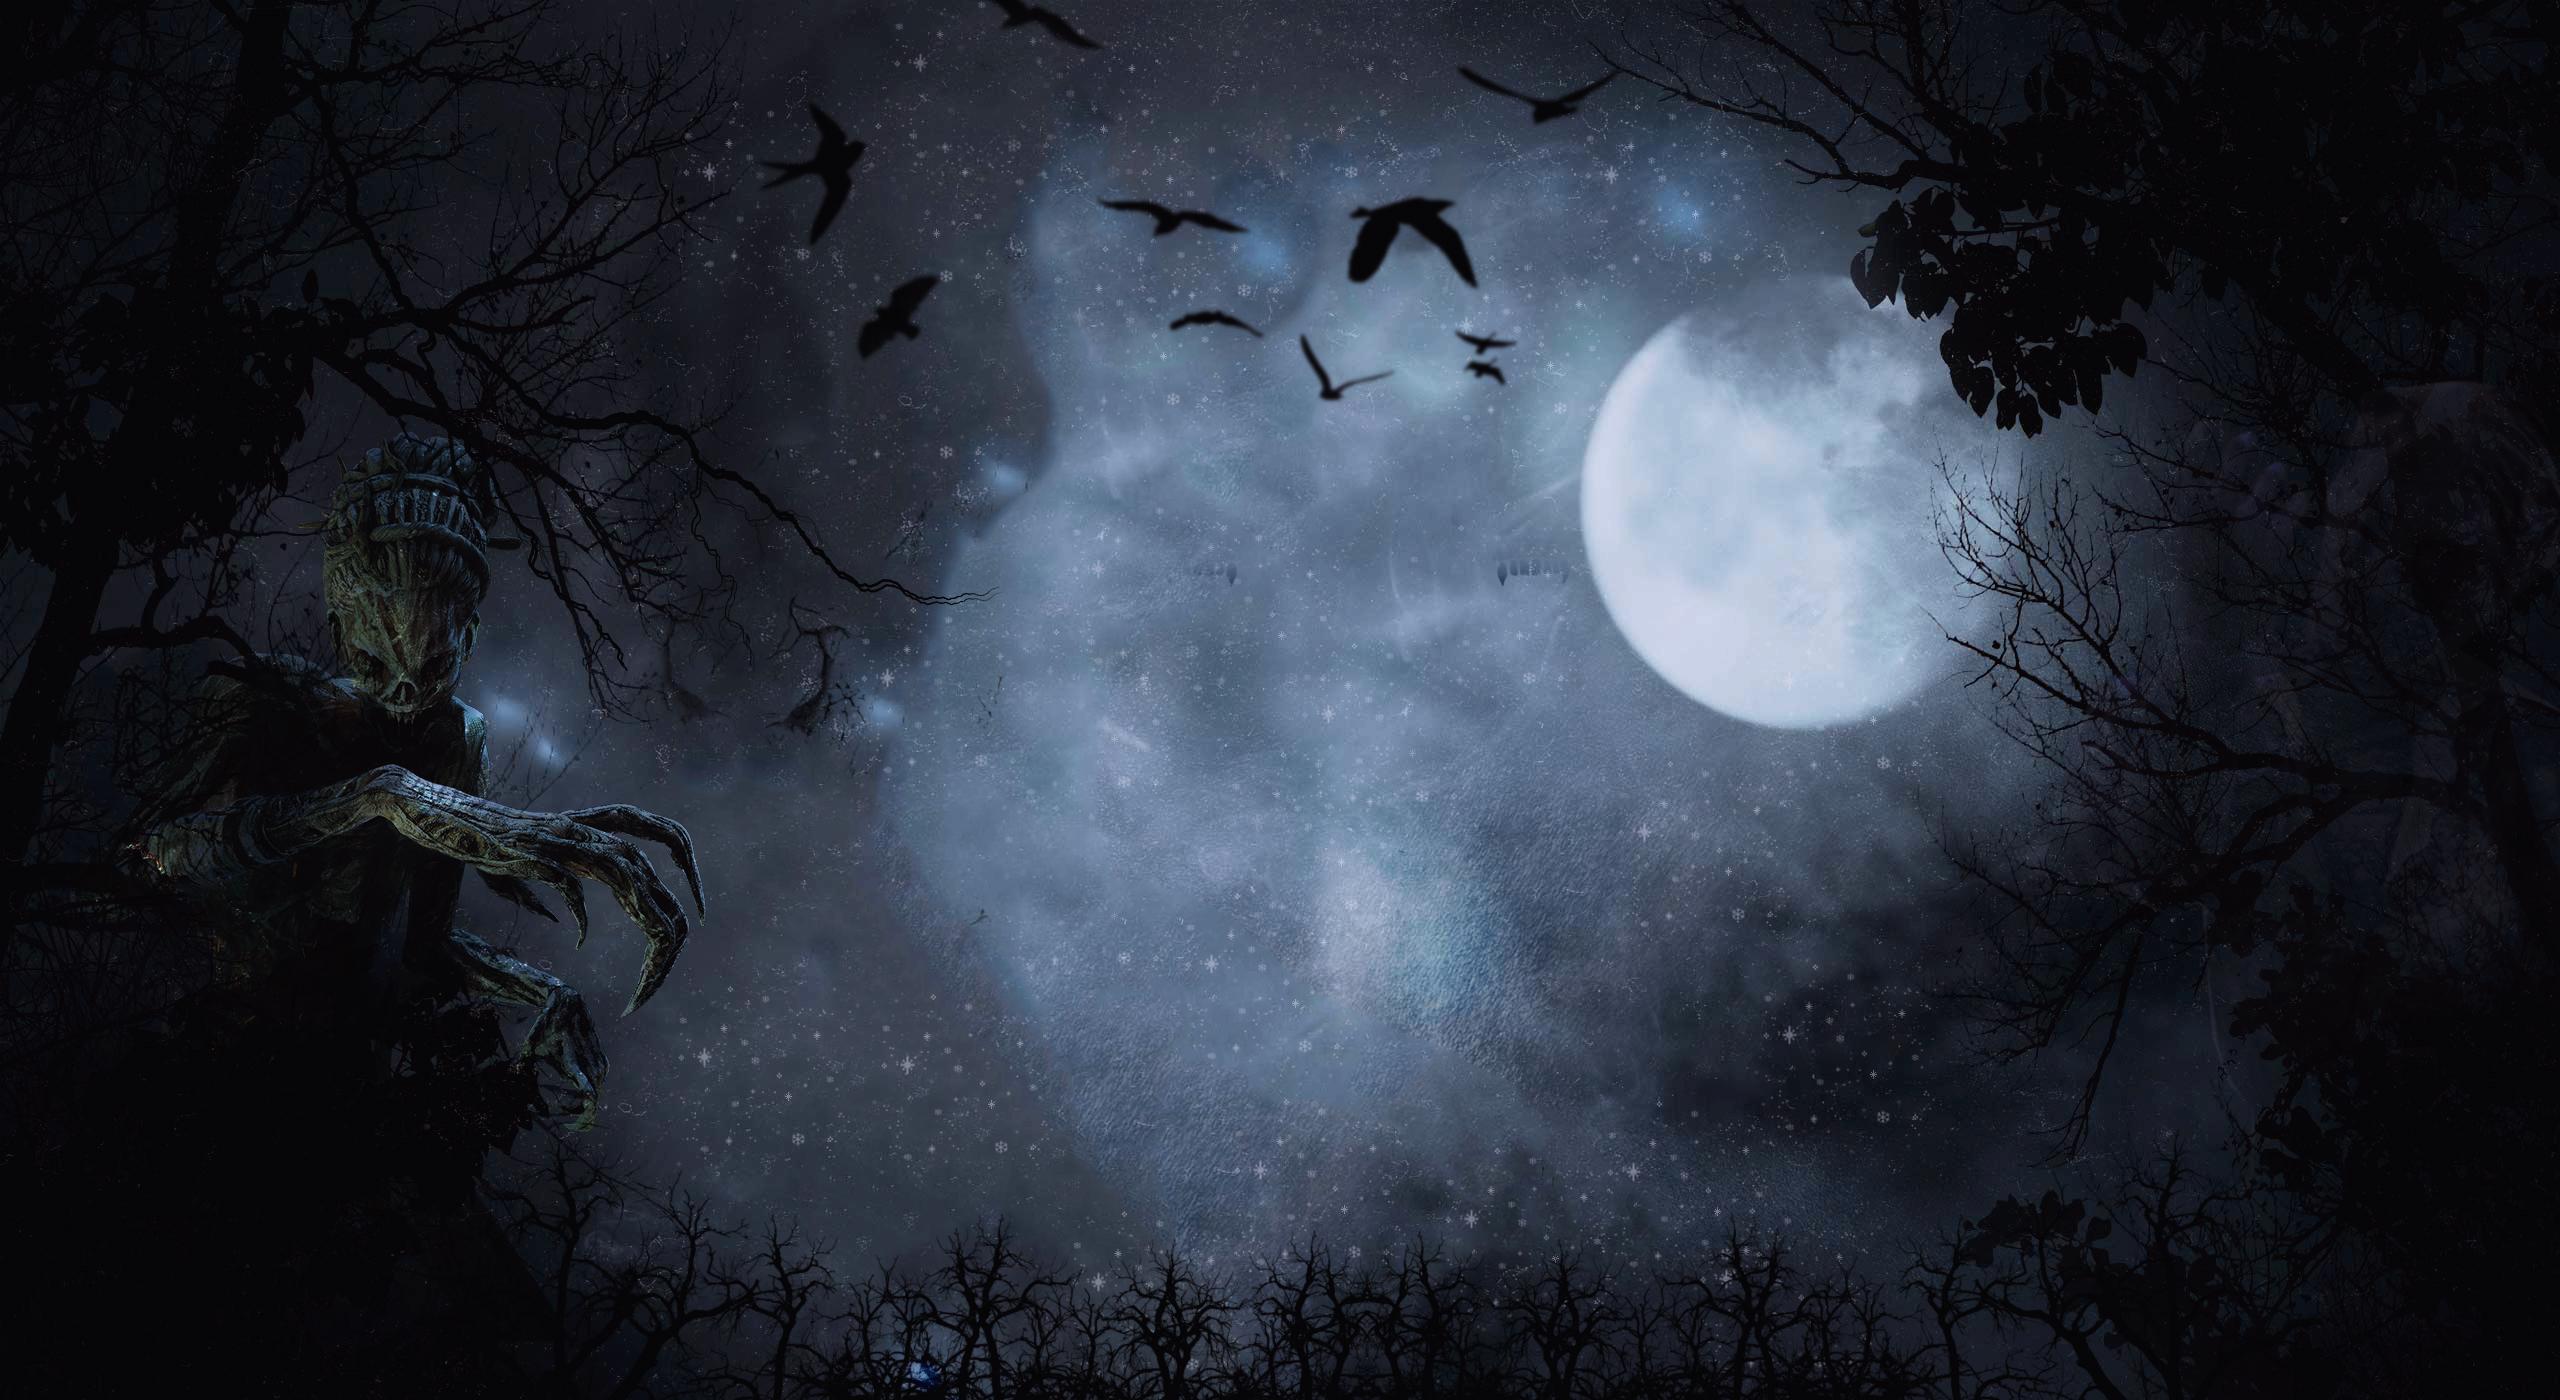 General 2560x1400 The Hag The Nurse Moon dark